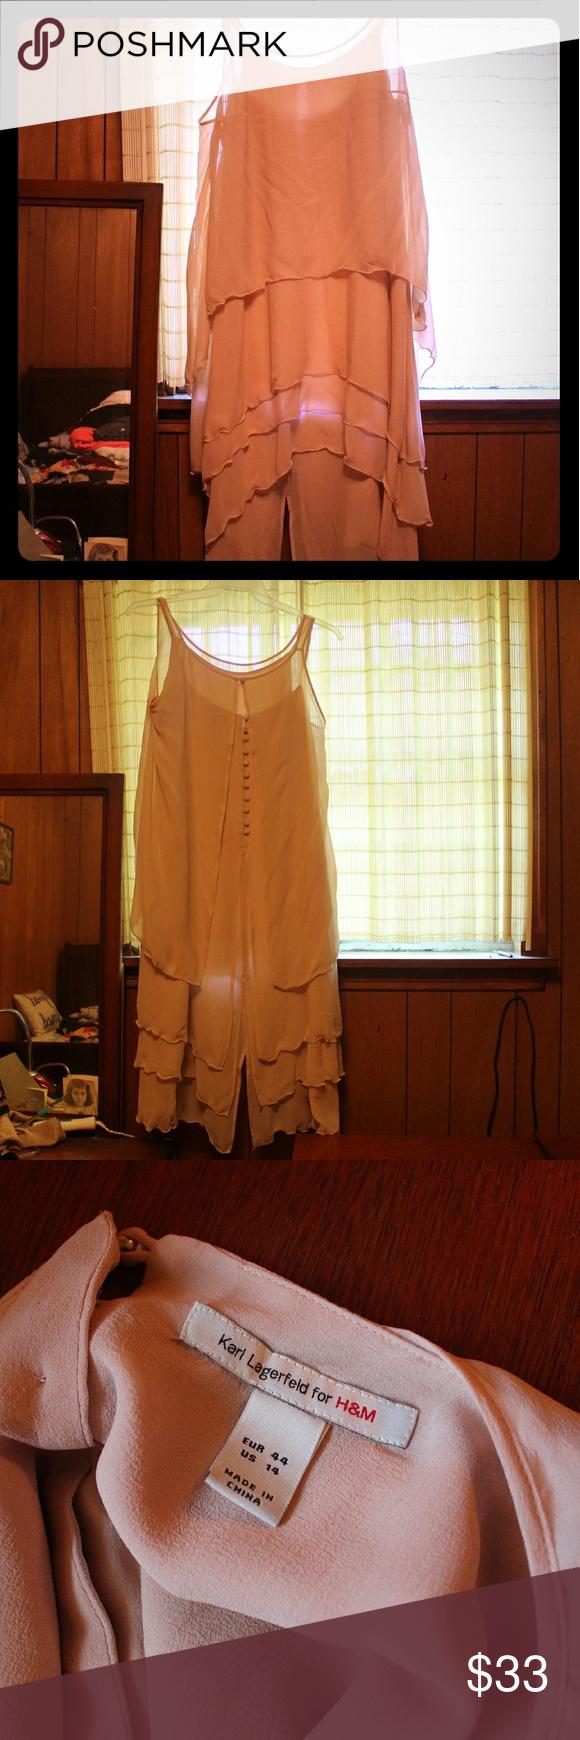 H&m dusty pink dress  HuMLagerfeld Dress Size  Dusty Pink  Dusty pink